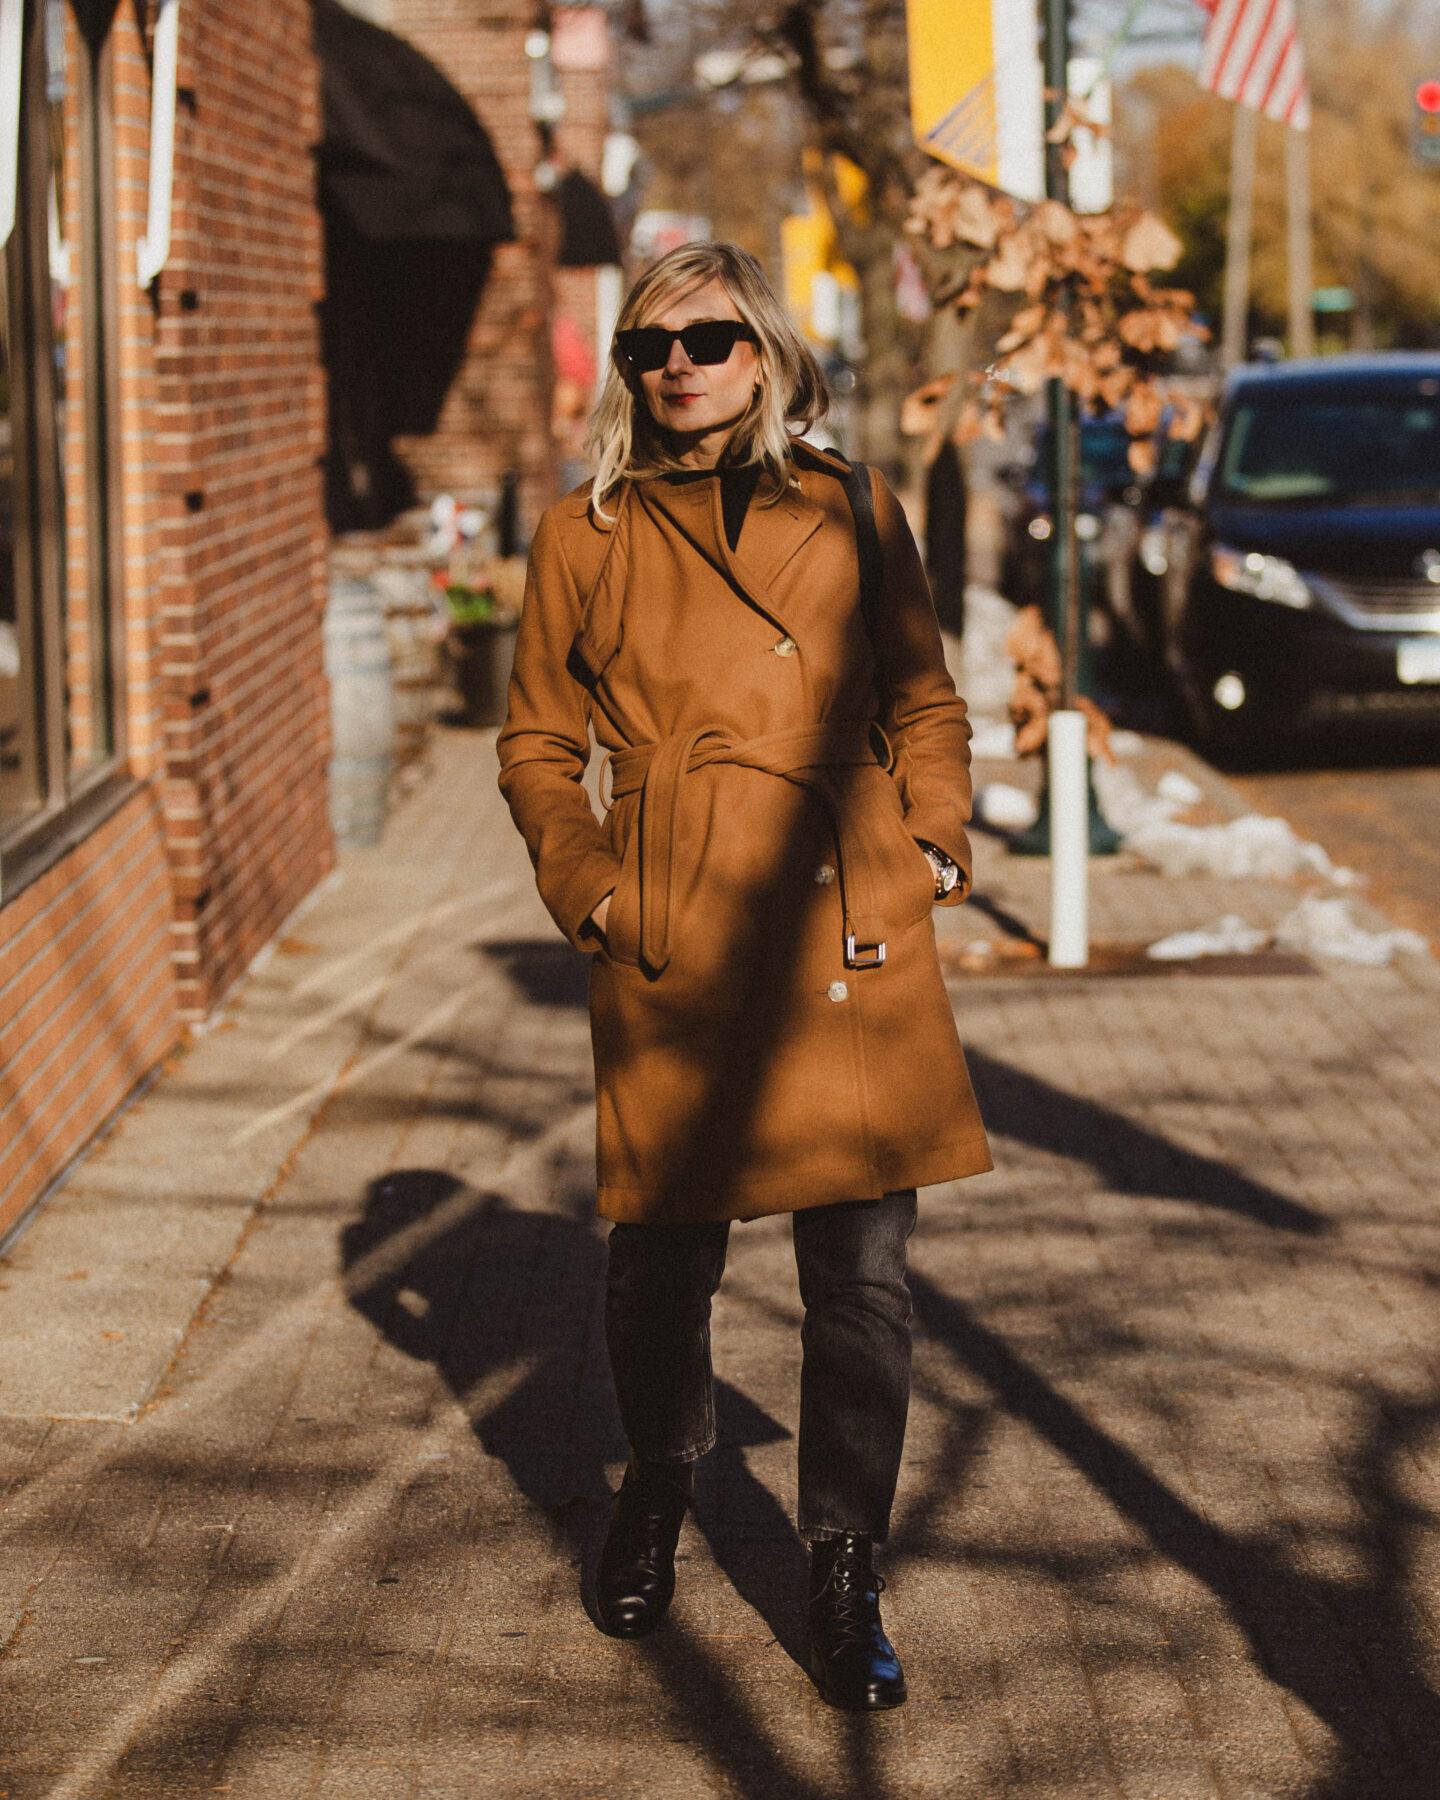 Karin Emily Style. Camel Coat, Washed Black Straight Leg Jeans, Lace Up Boots, Black Cat Eye Sunglasses